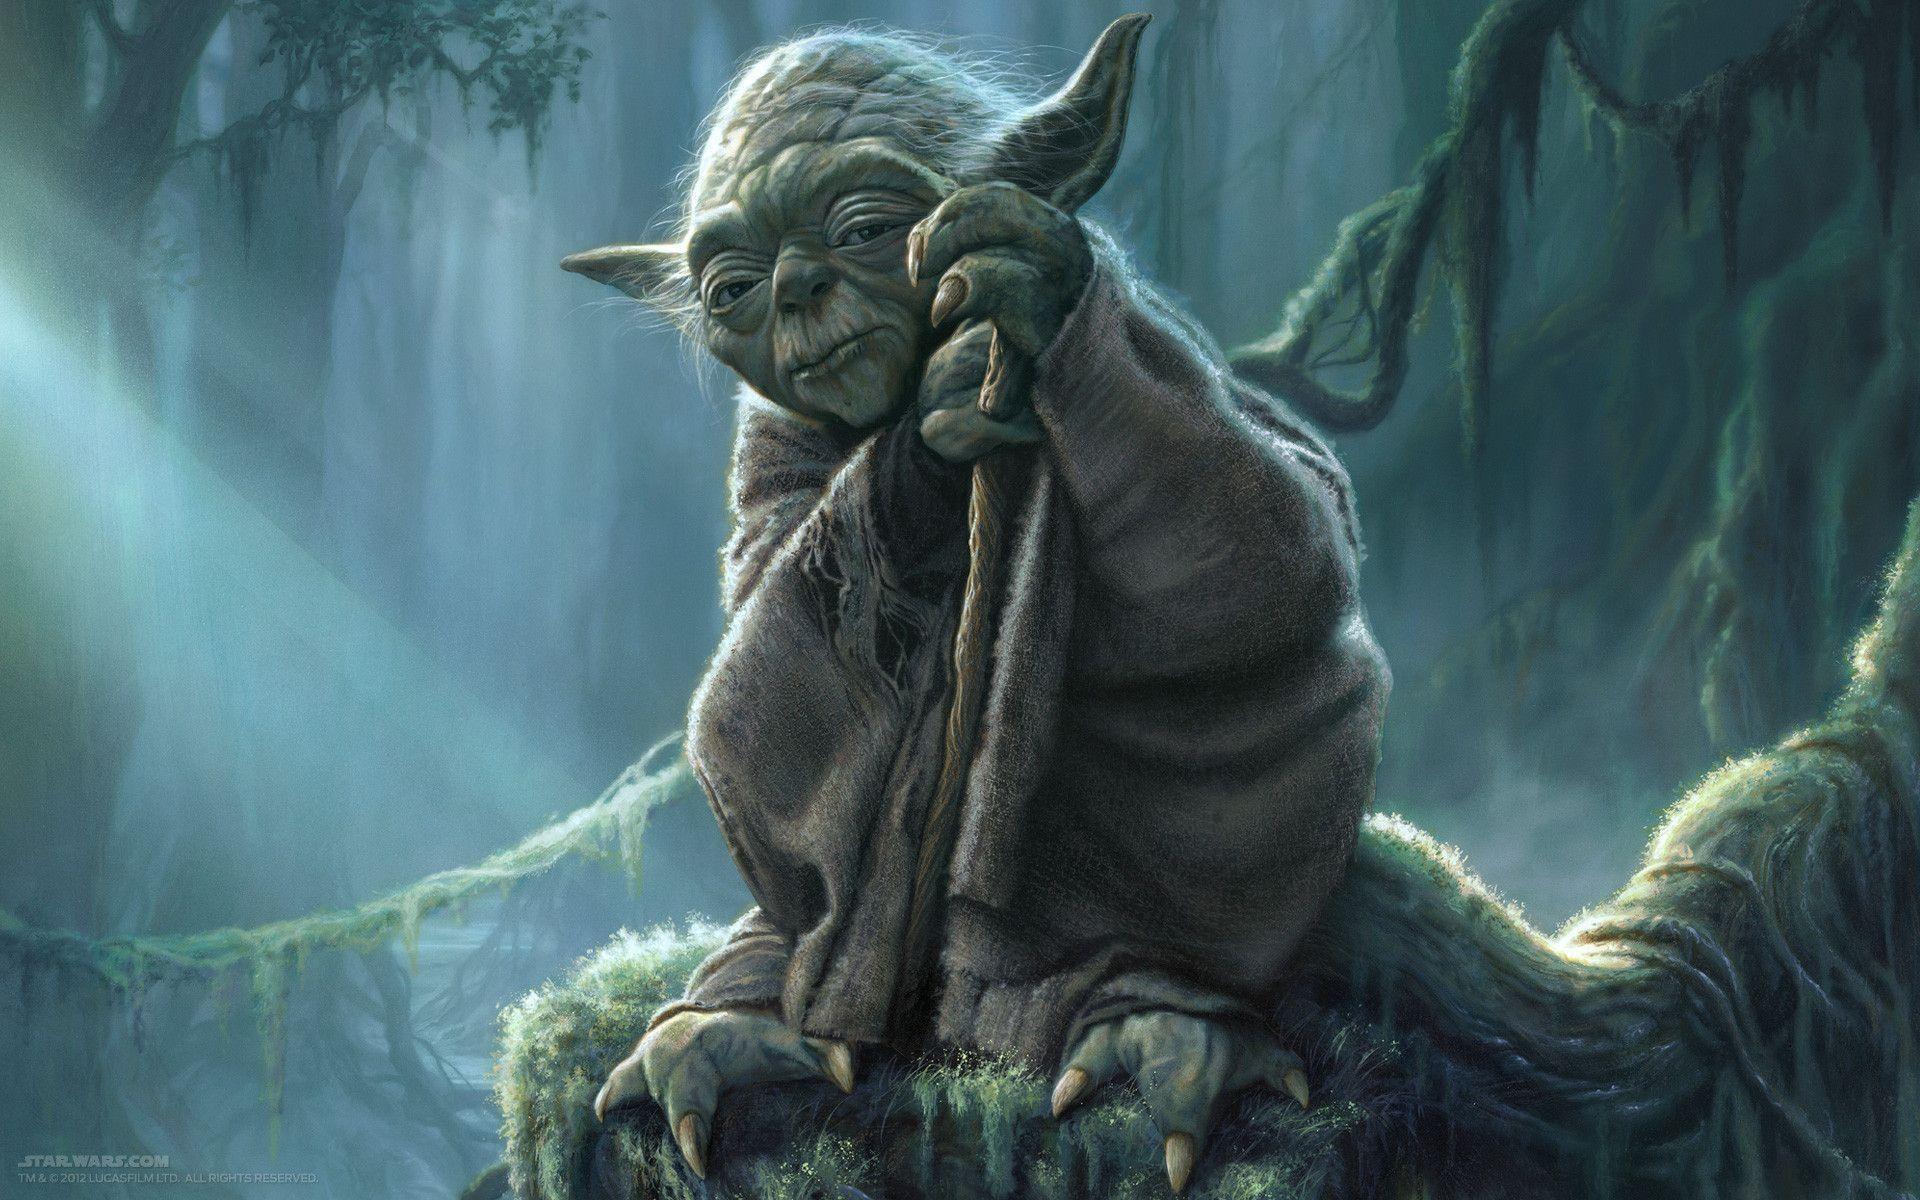 Yoda Wallpaper 1920x1080